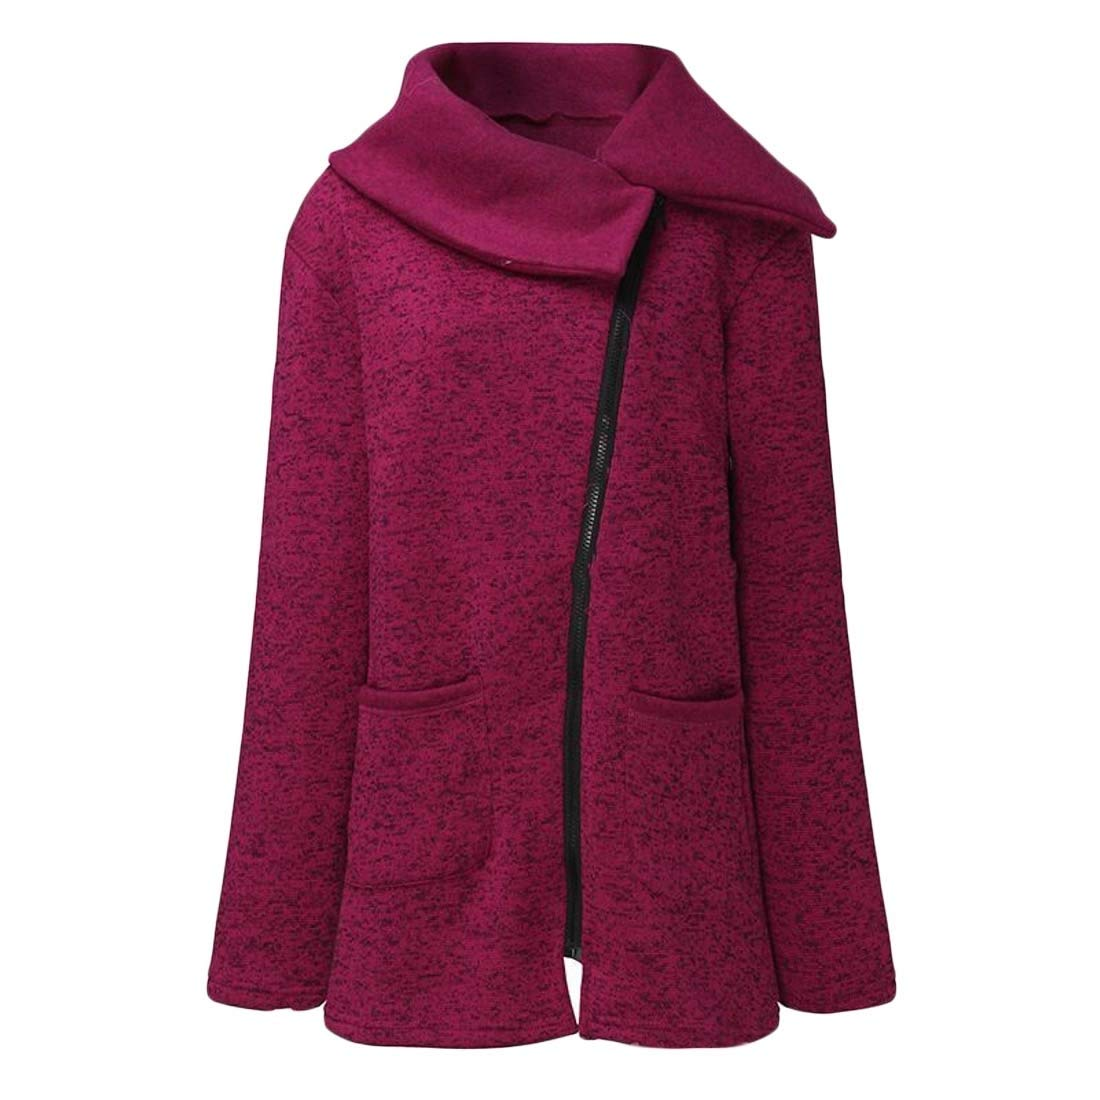 Fubotevic Womens Full Zip Plus Size Fleece Sweatshirts Jacket Coat Outerwear